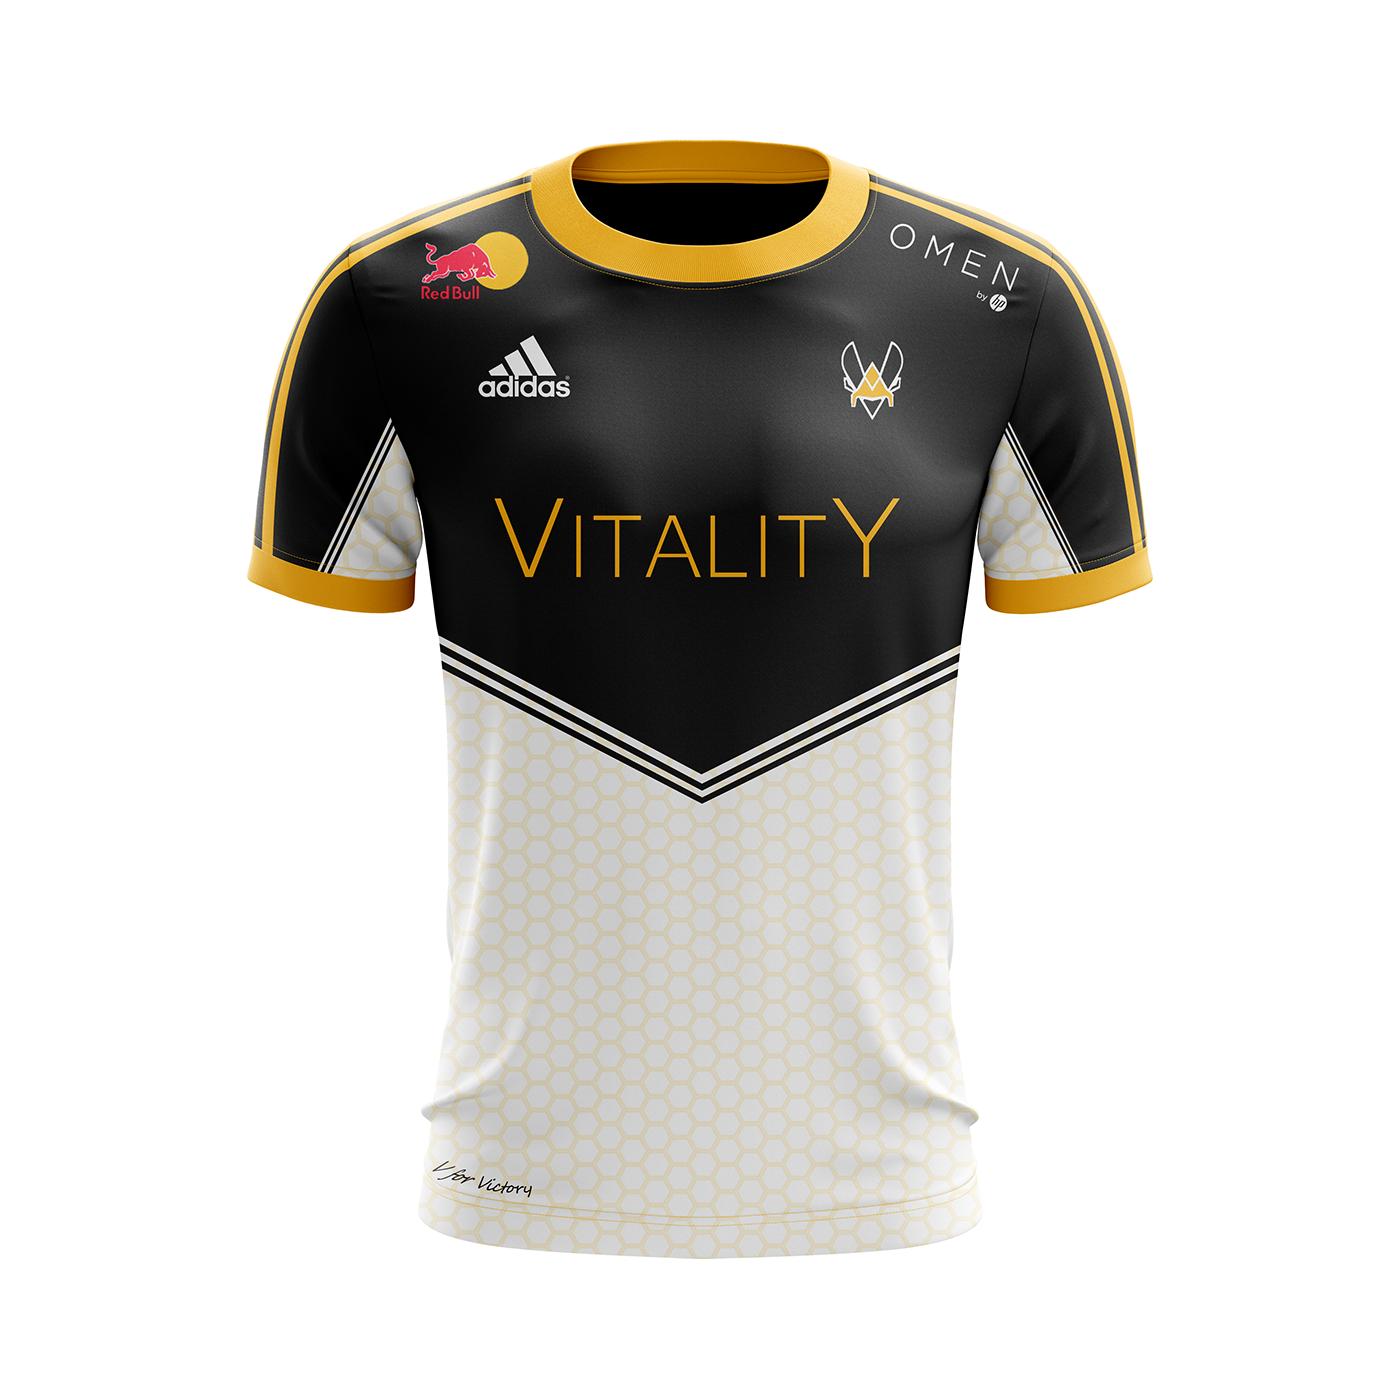 Concept On Team Vitality Jersey Behance tQrshdC